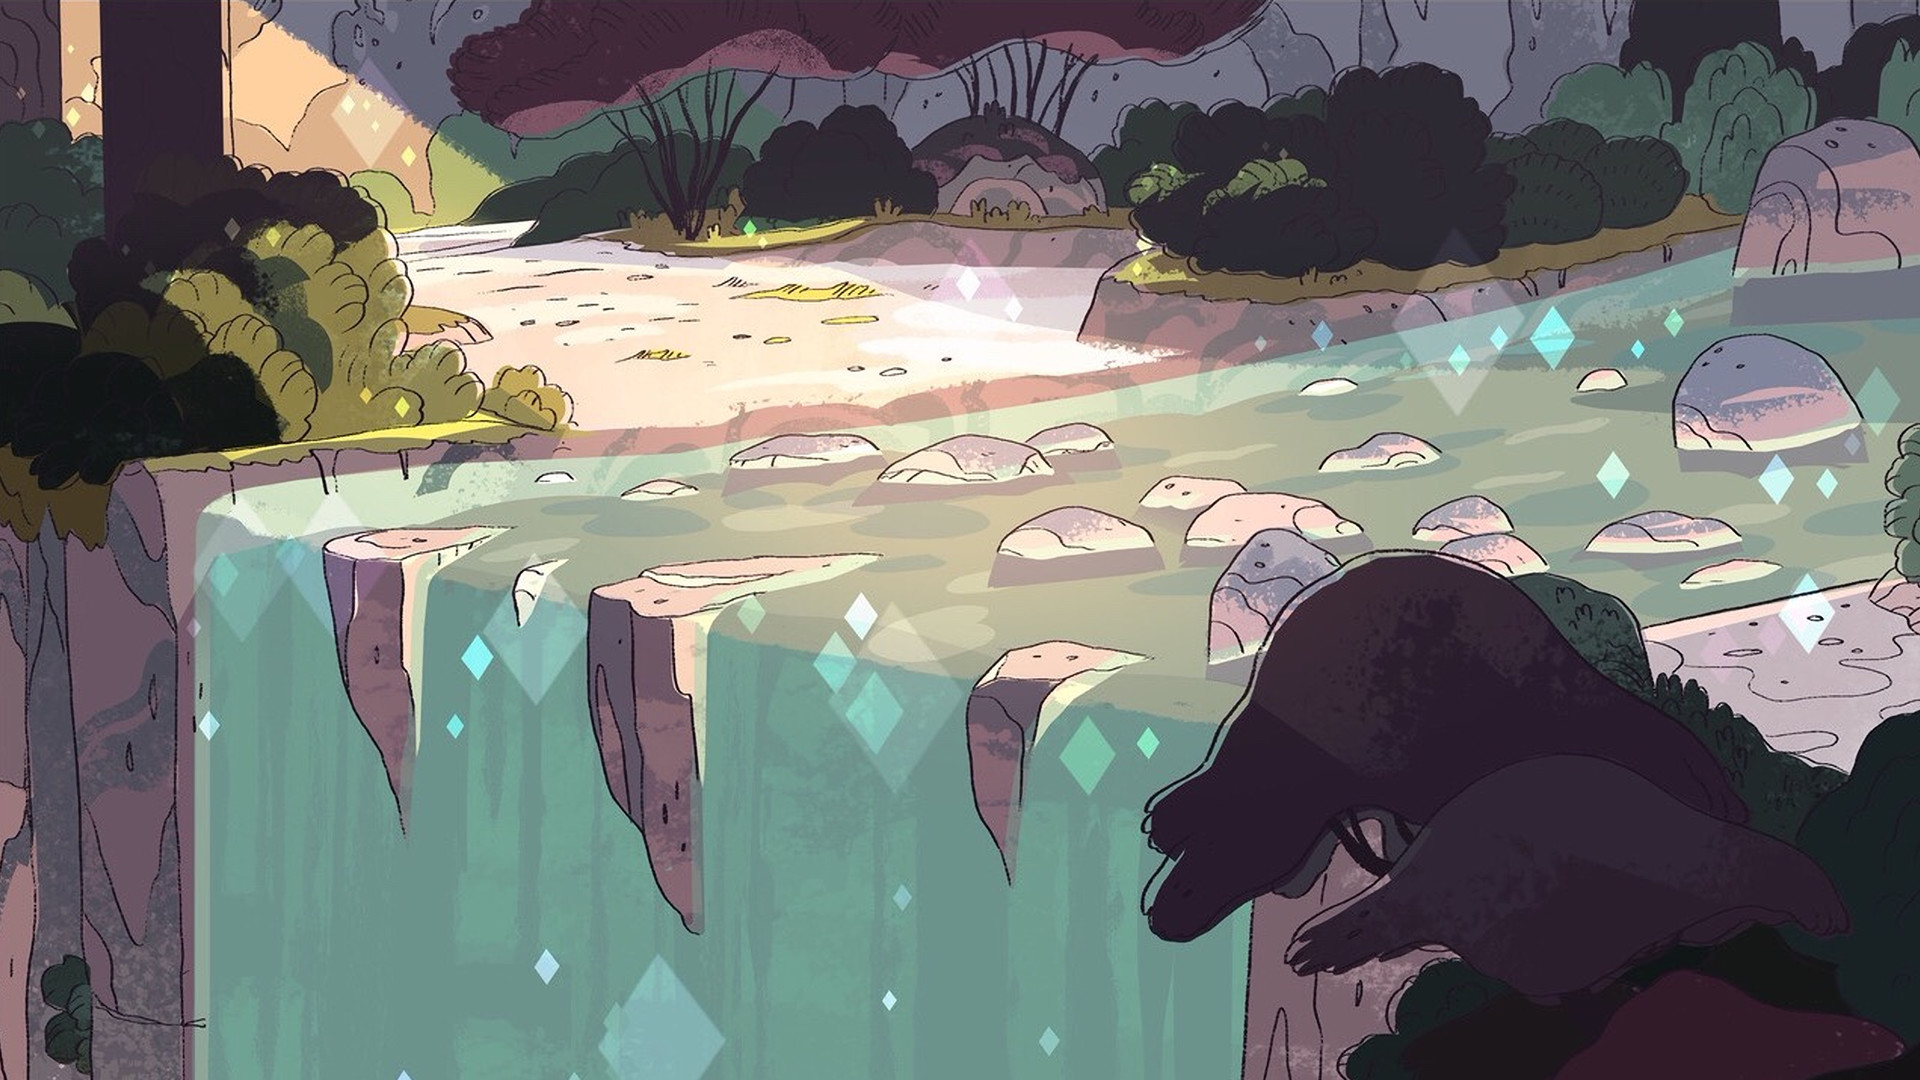 artwork, Waterfall, Steven Universe Wallpaper